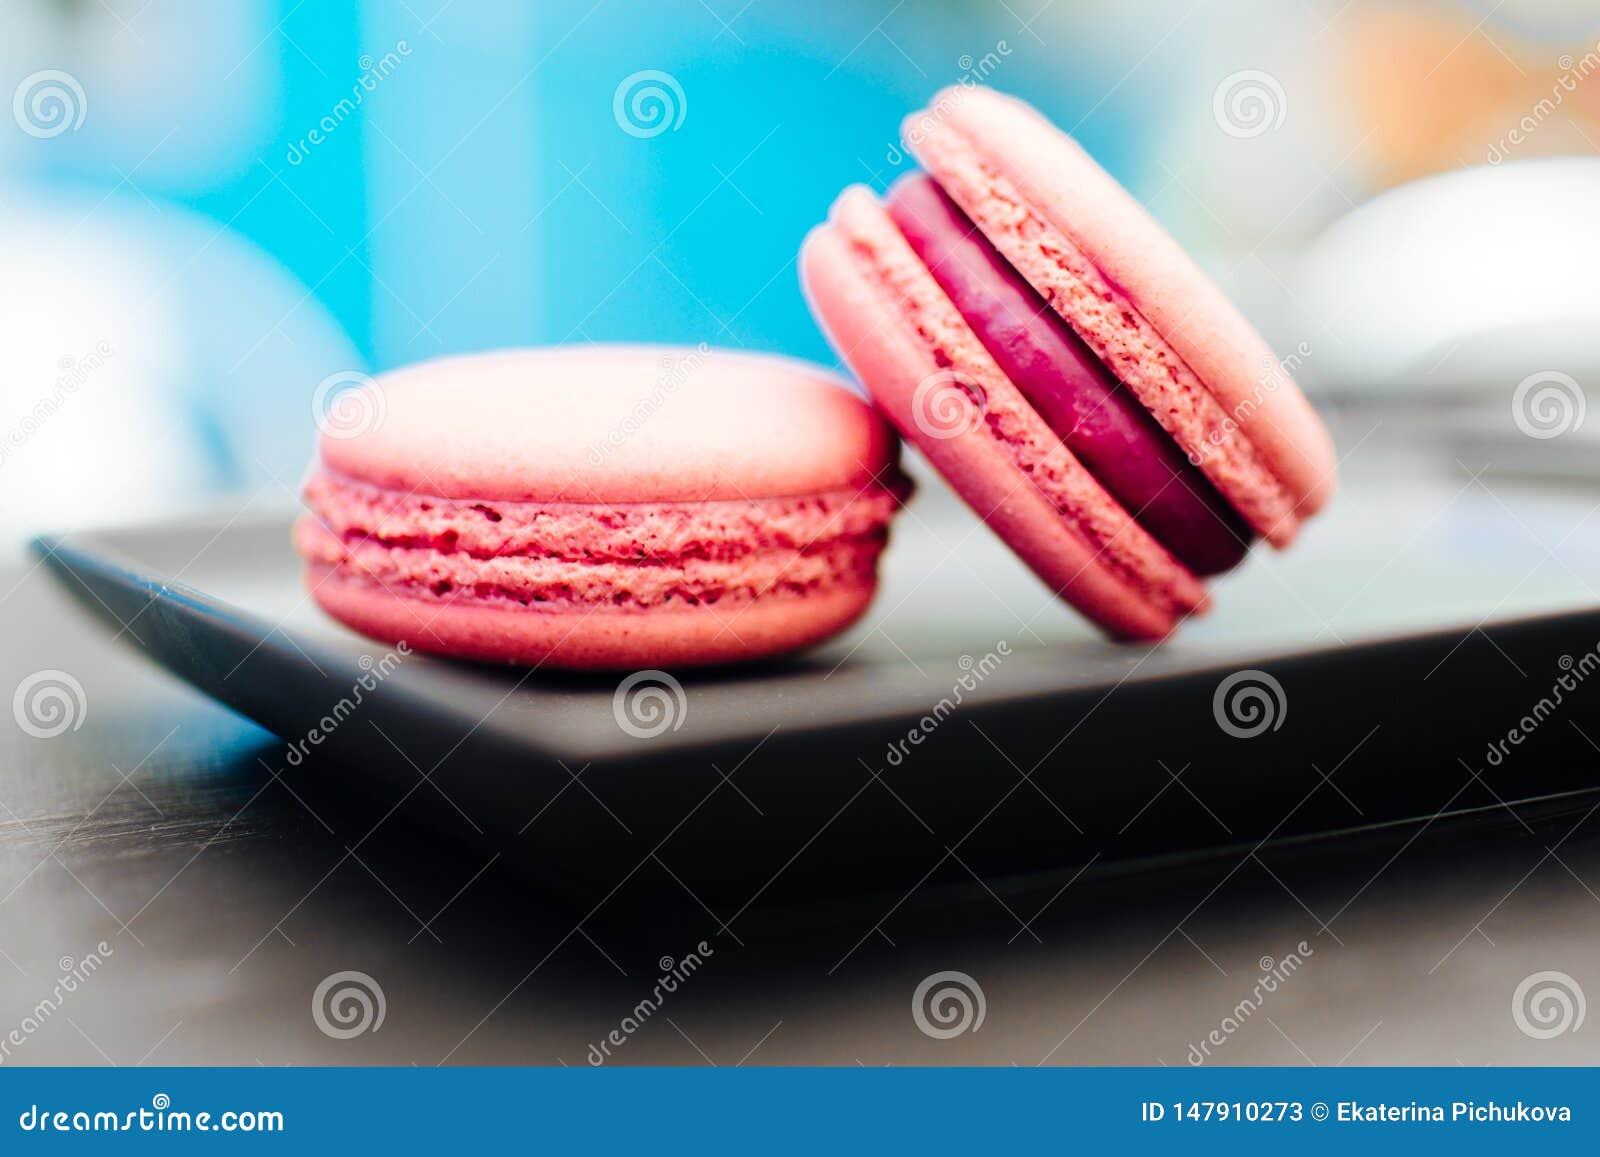 Dolce, macarons freschi con caff? in una tazza blu su una tavola nera